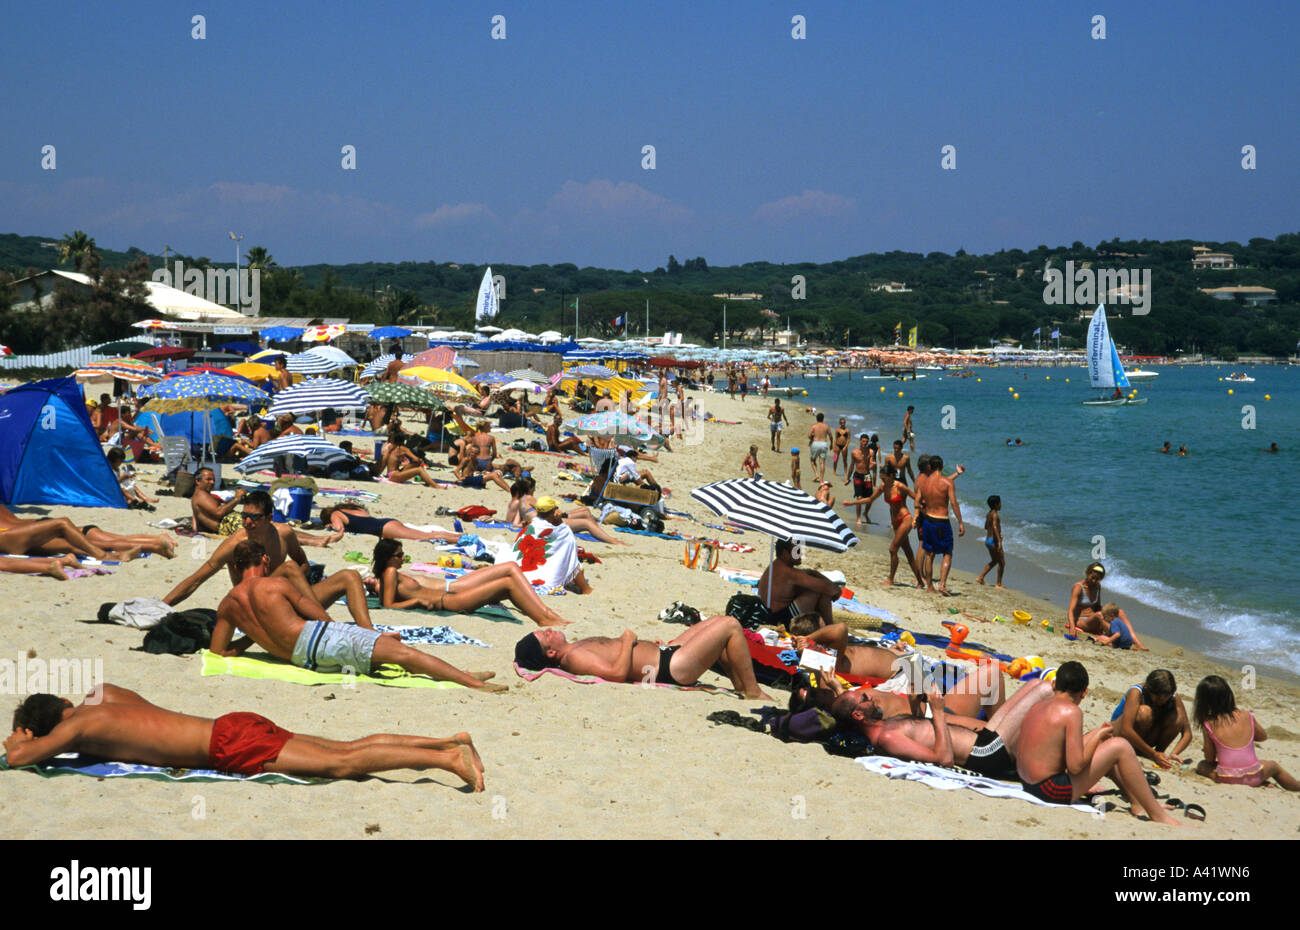 Pampelonne Beach Saint Tropez France Stock Photos Pampelonne